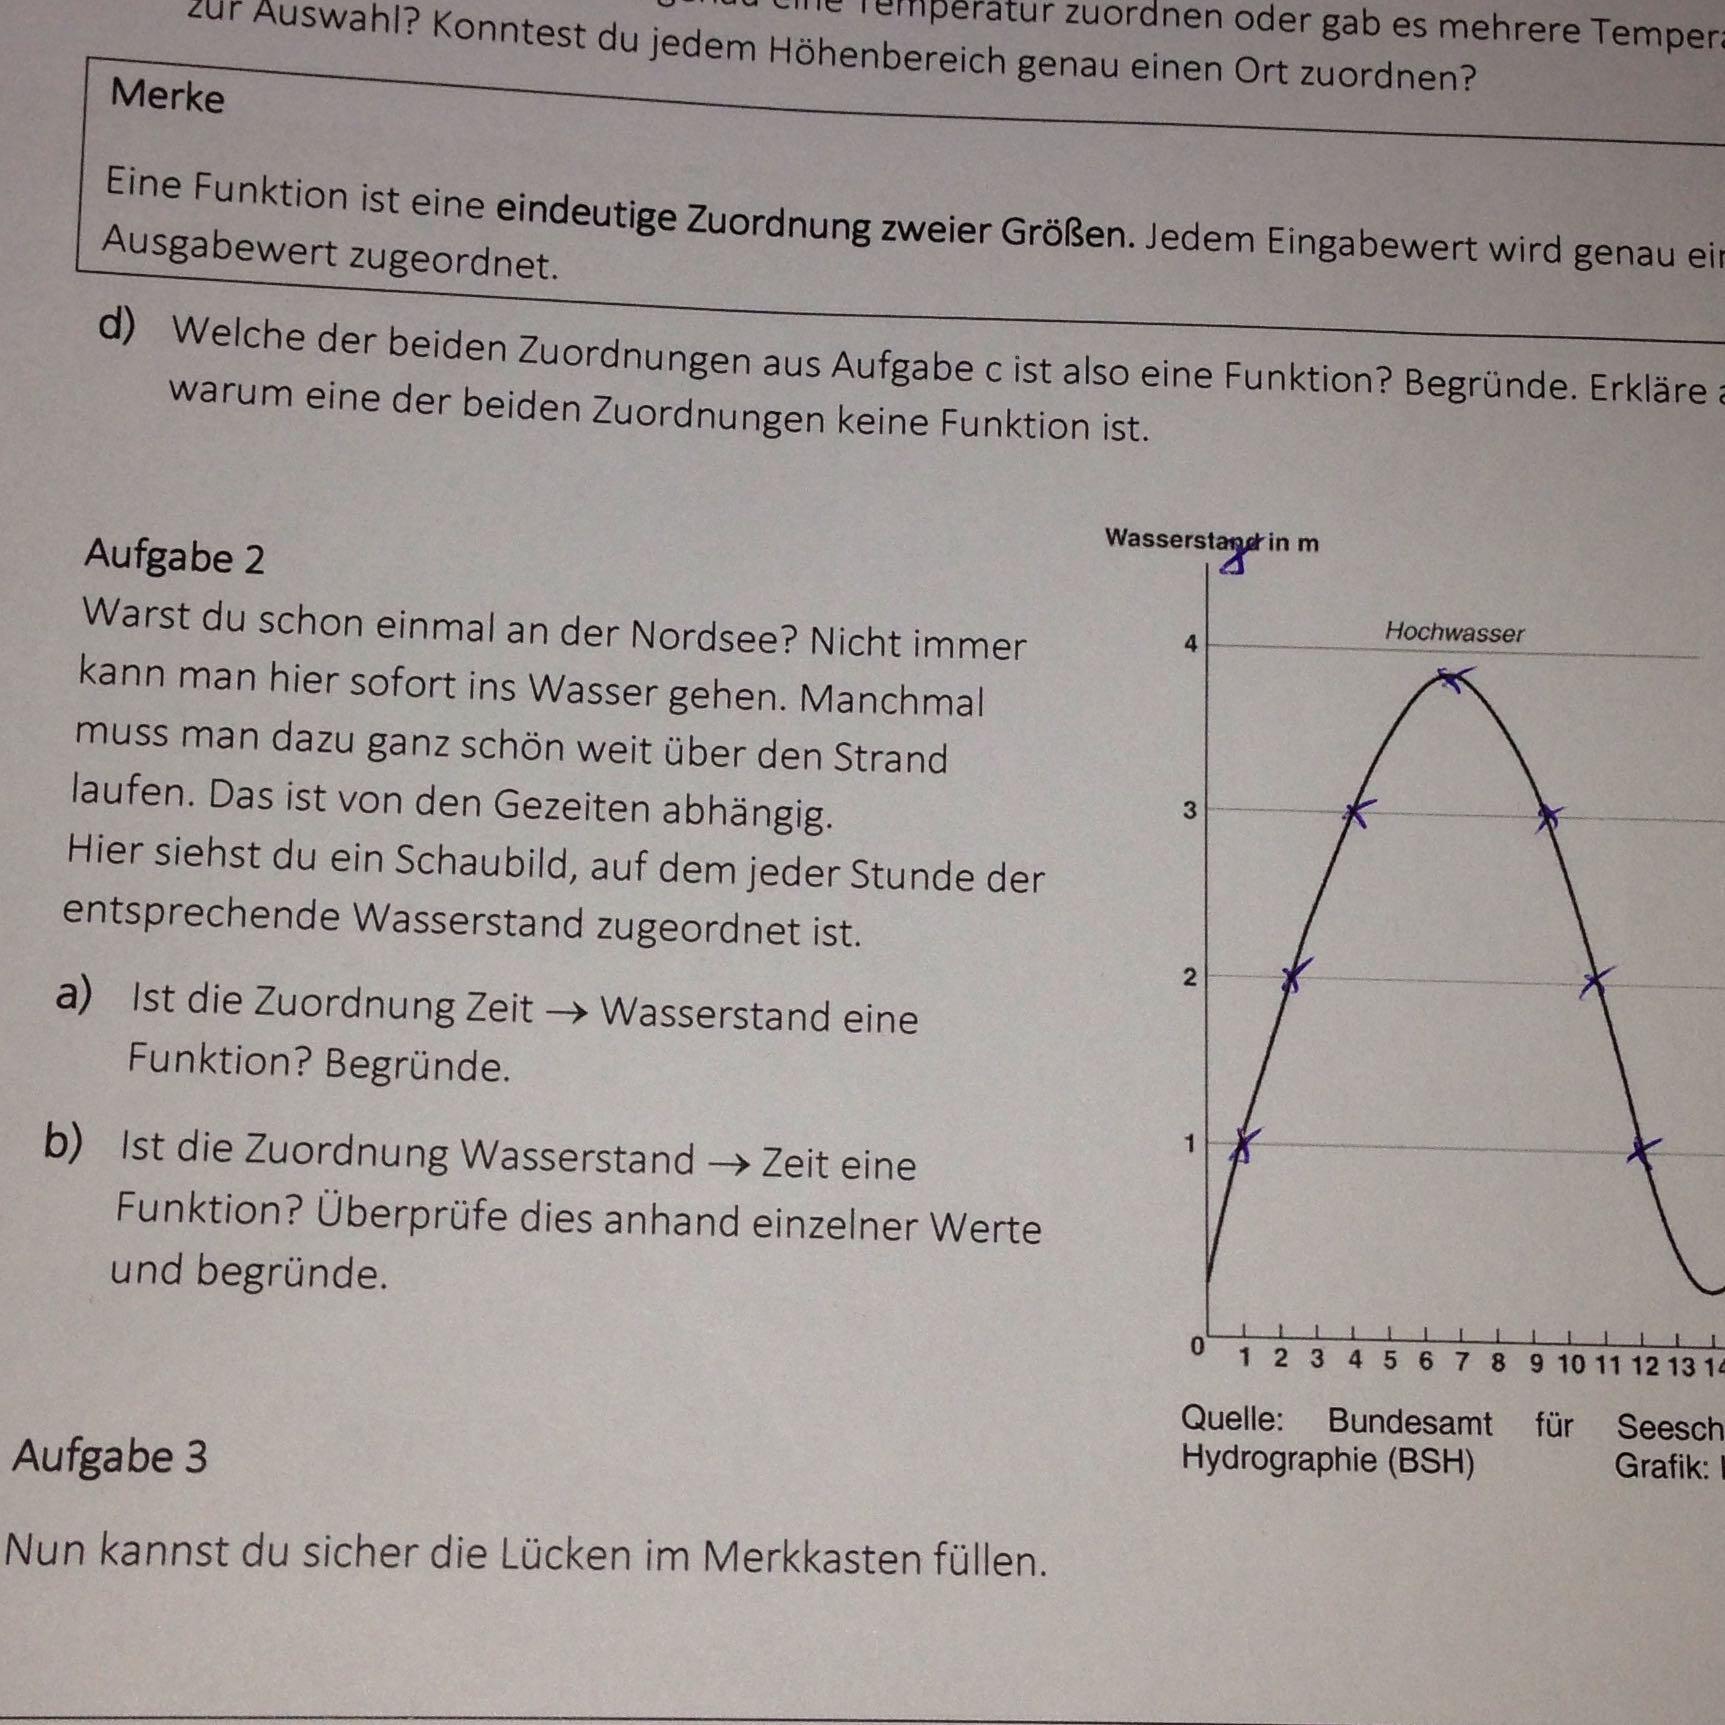 Ziemlich 1 Sec Mathematik Arbeitsblatt Ideen - Super Lehrer ...